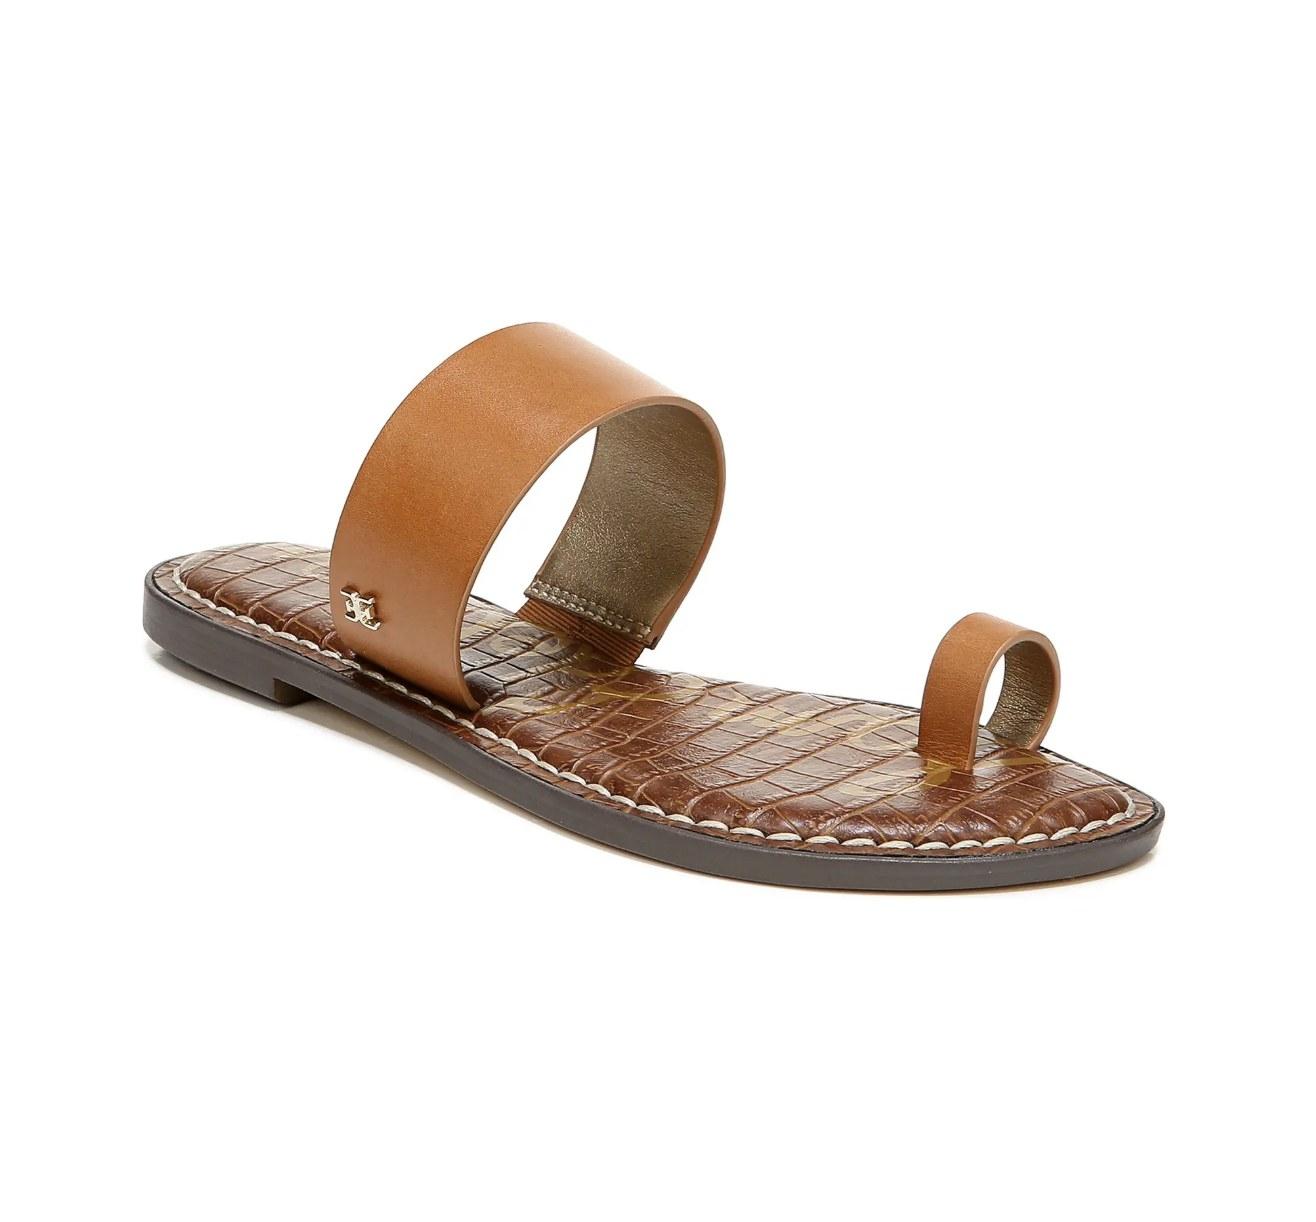 The Sam Edelman slide sandal in saddle leather